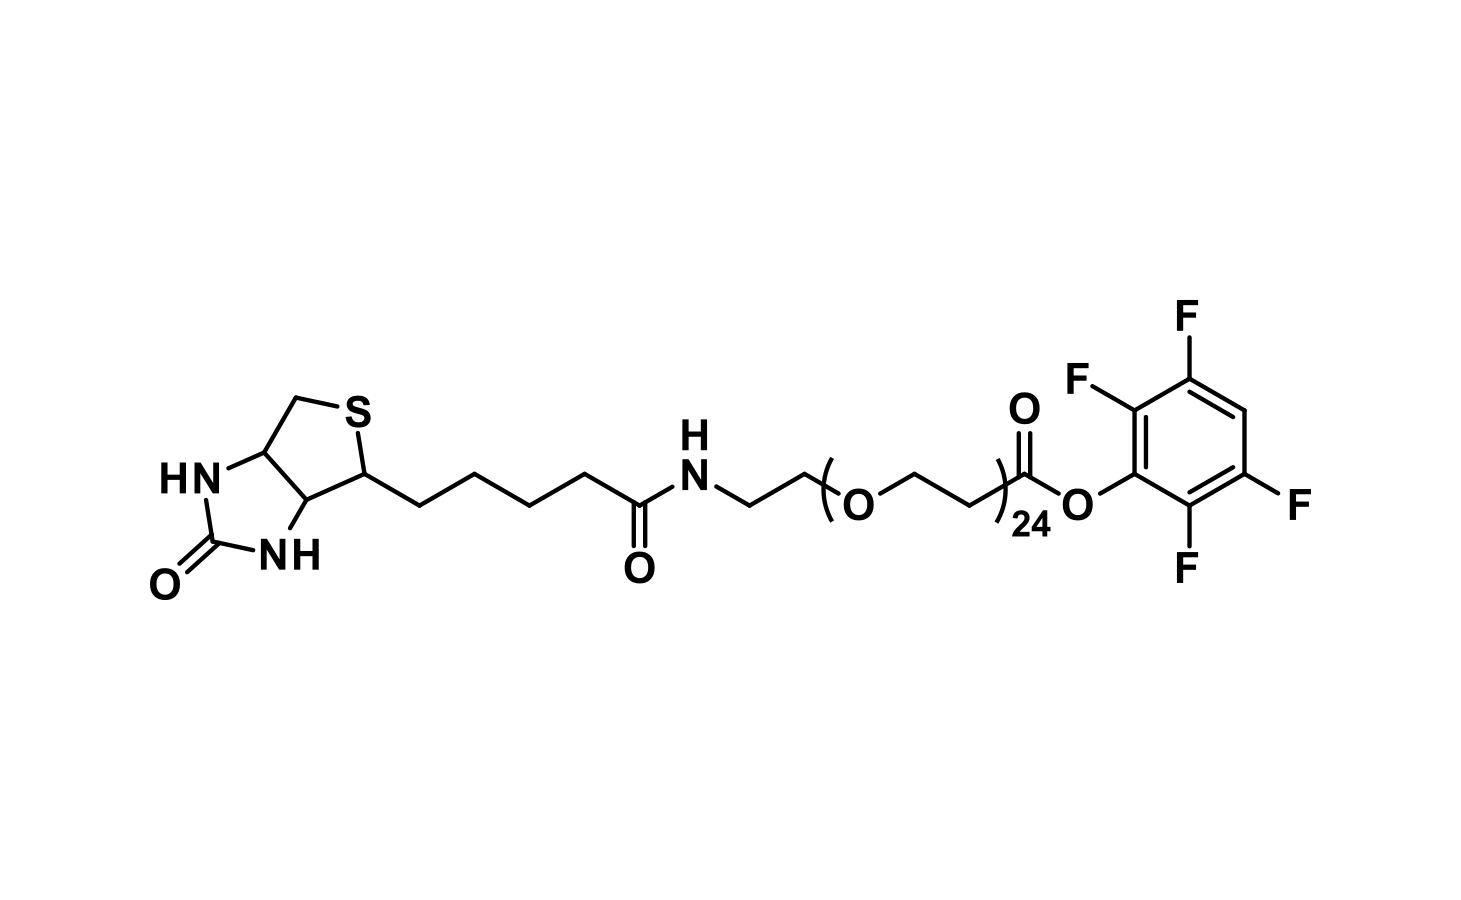 Biotin-dPEG®₂₄-TFP ester